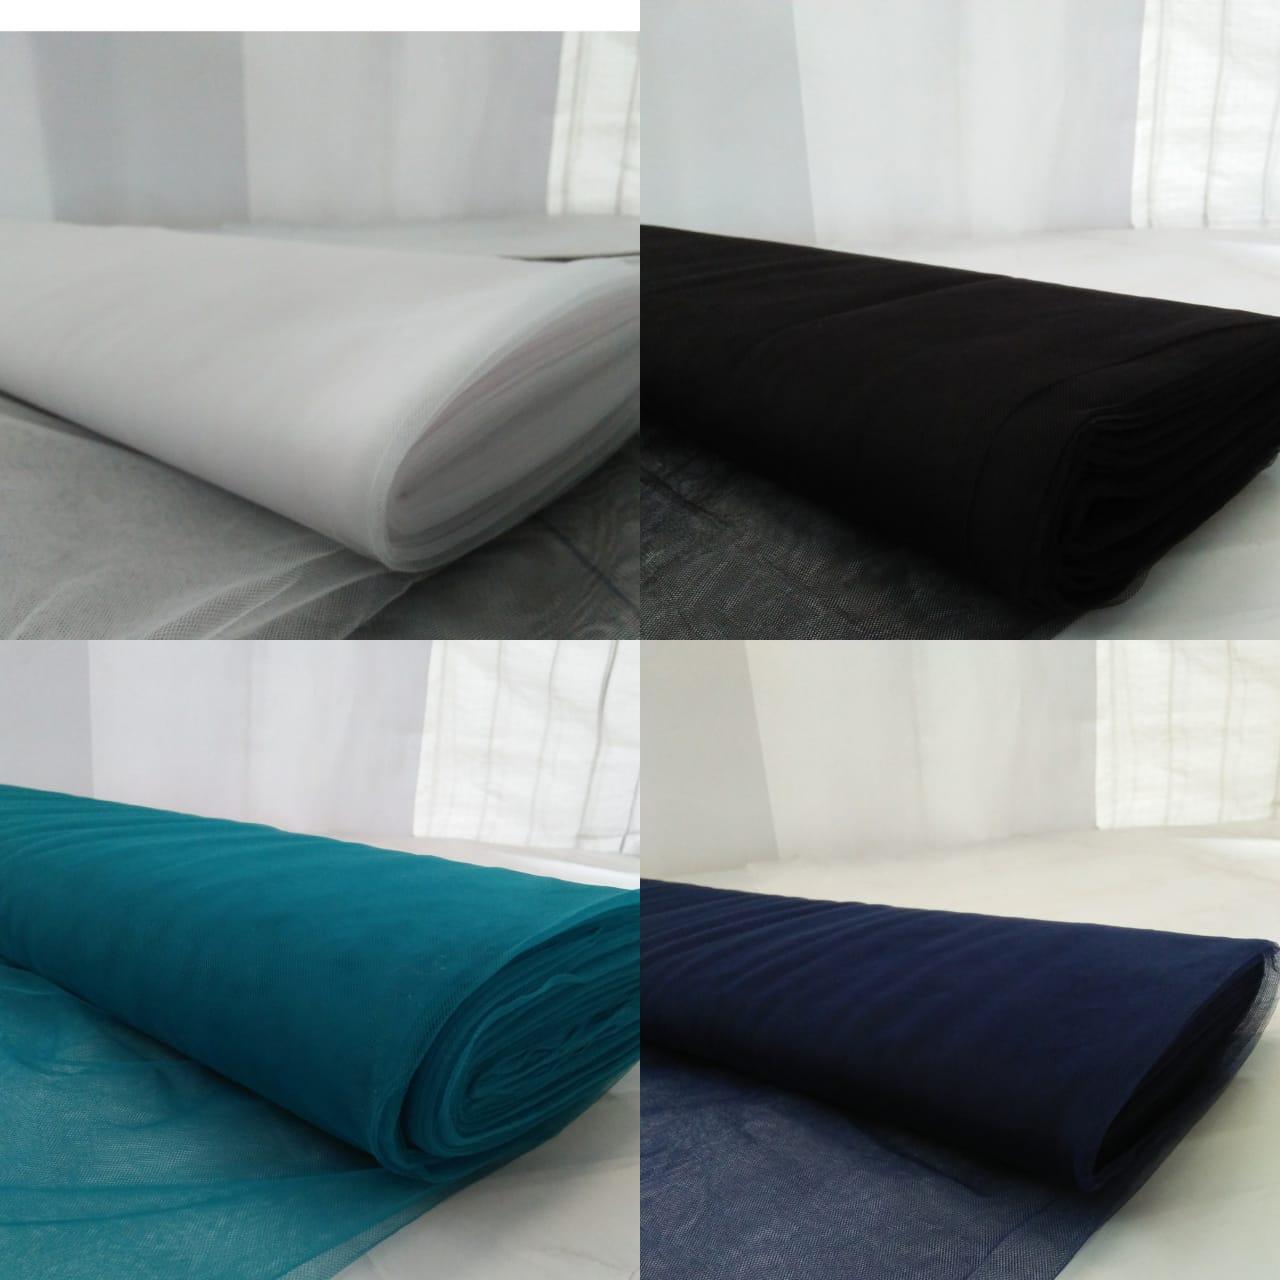 tulle tille dekorasi pesta kelambu souvenir buatan pabrik bandung PT.wiratama prima textile indo